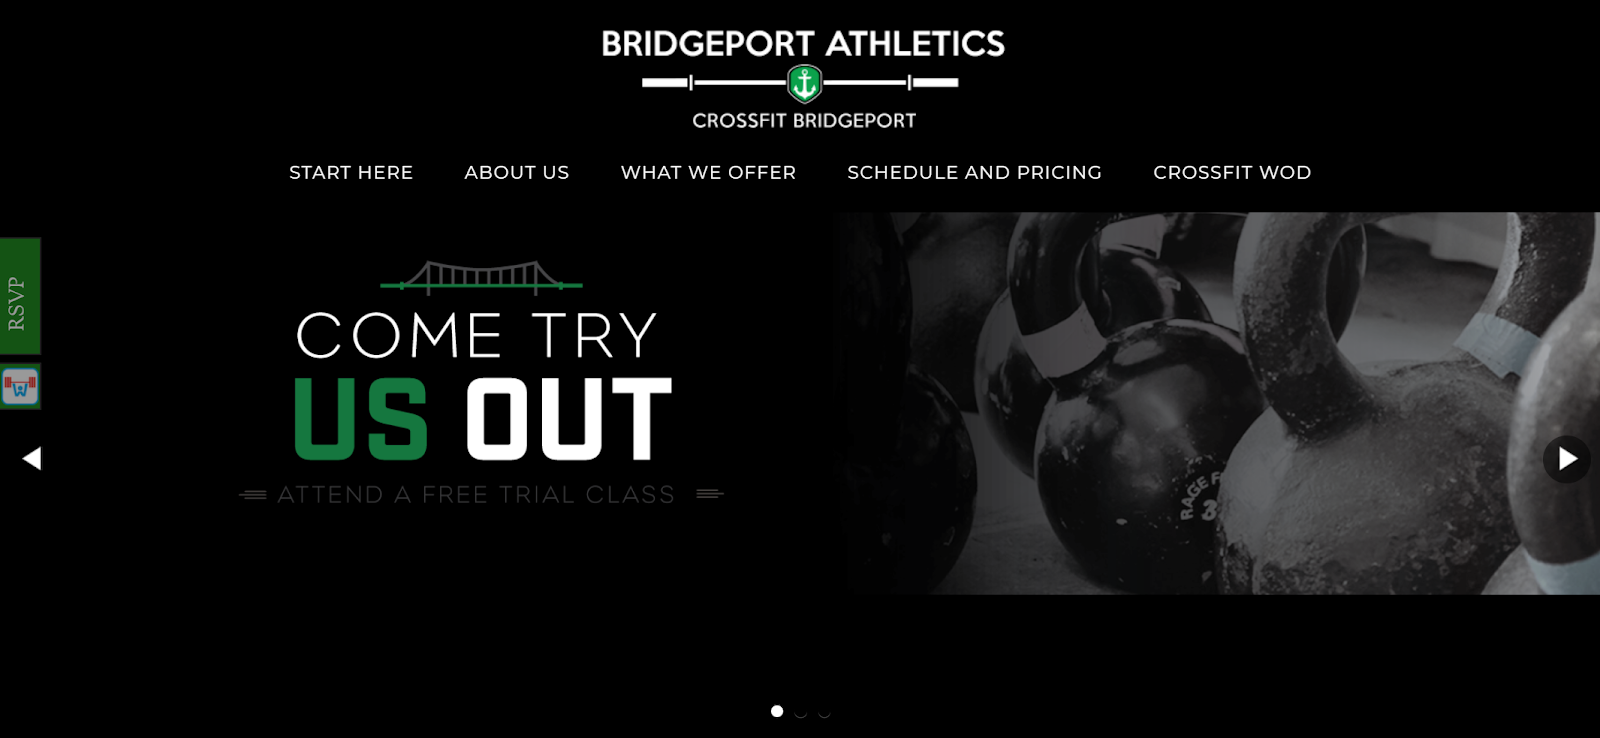 Bridgeport Athletics